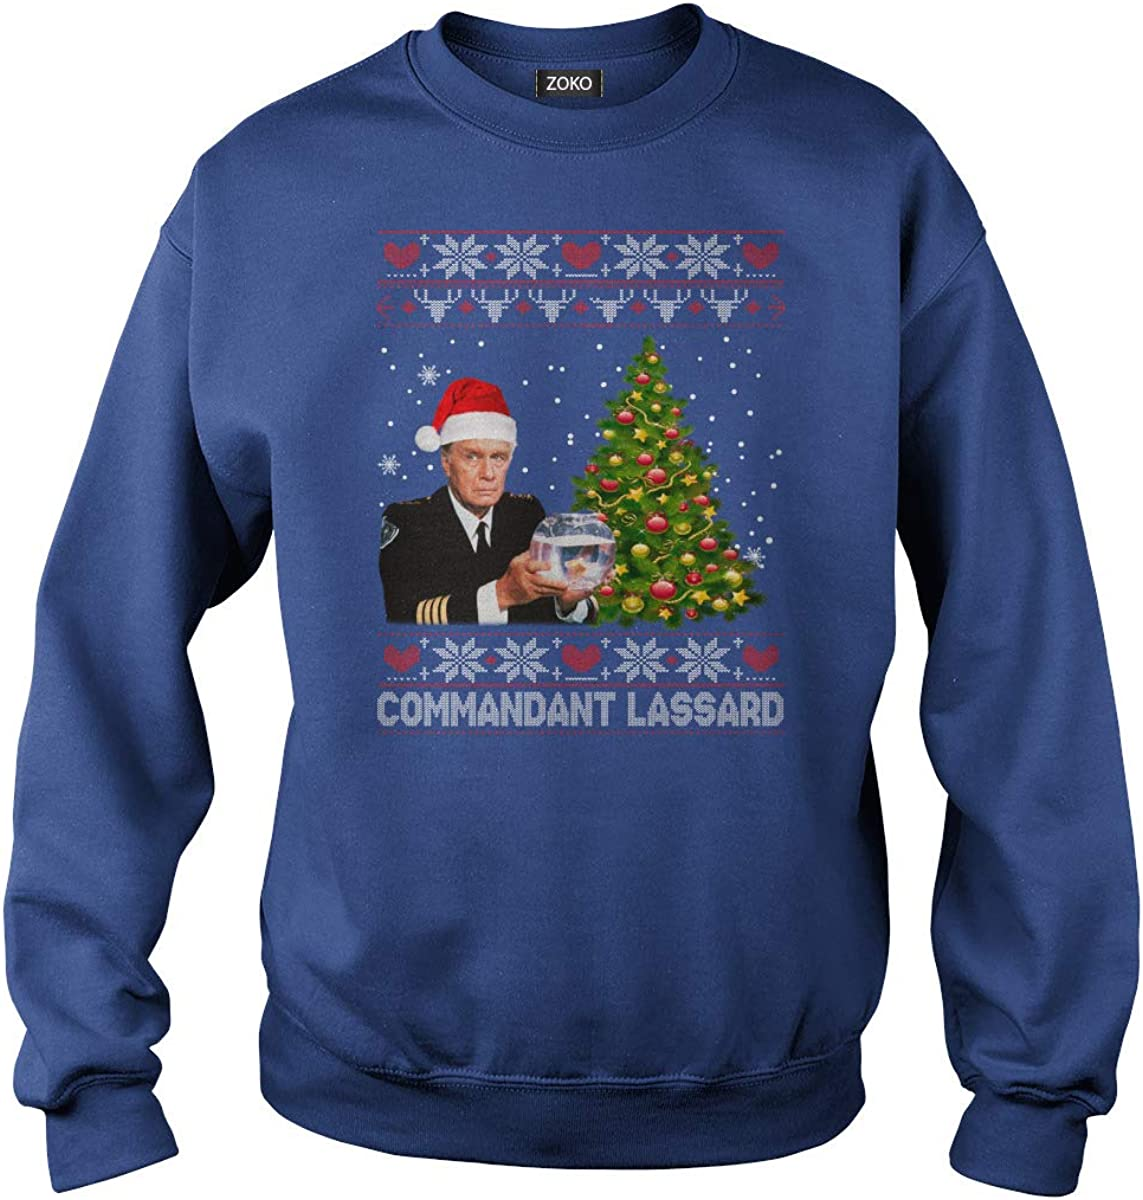 Zoko Apparel Commandant Lassard Ugly Christmas T-Shirt